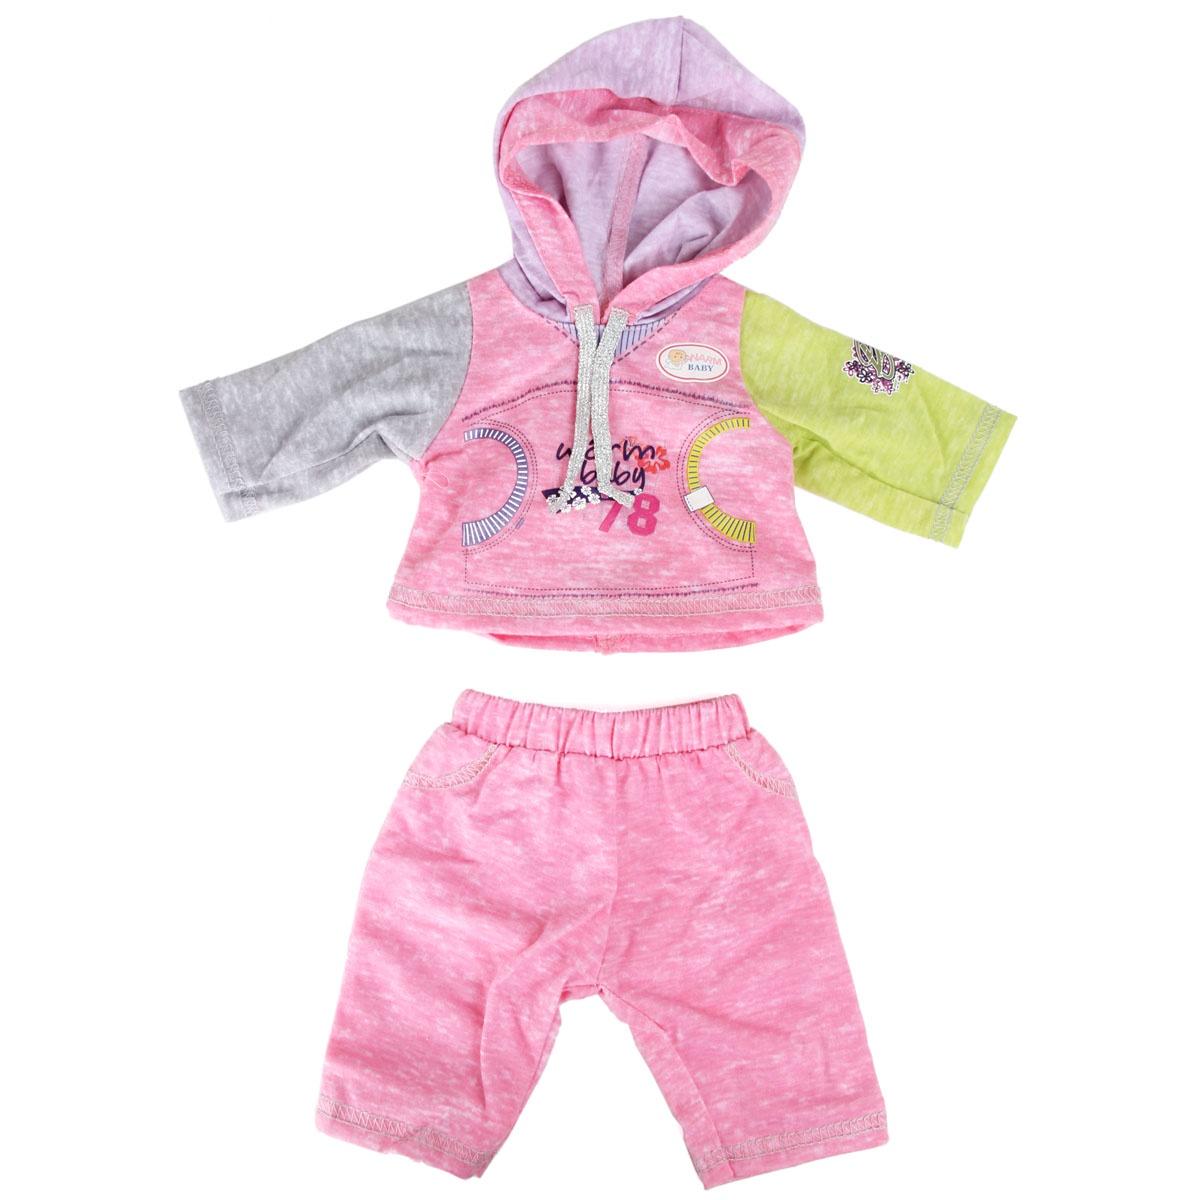 куклы и одежда для кукол asi одежда для кукол 60 см 0000092 Одежда для кукол Veld Co 75907